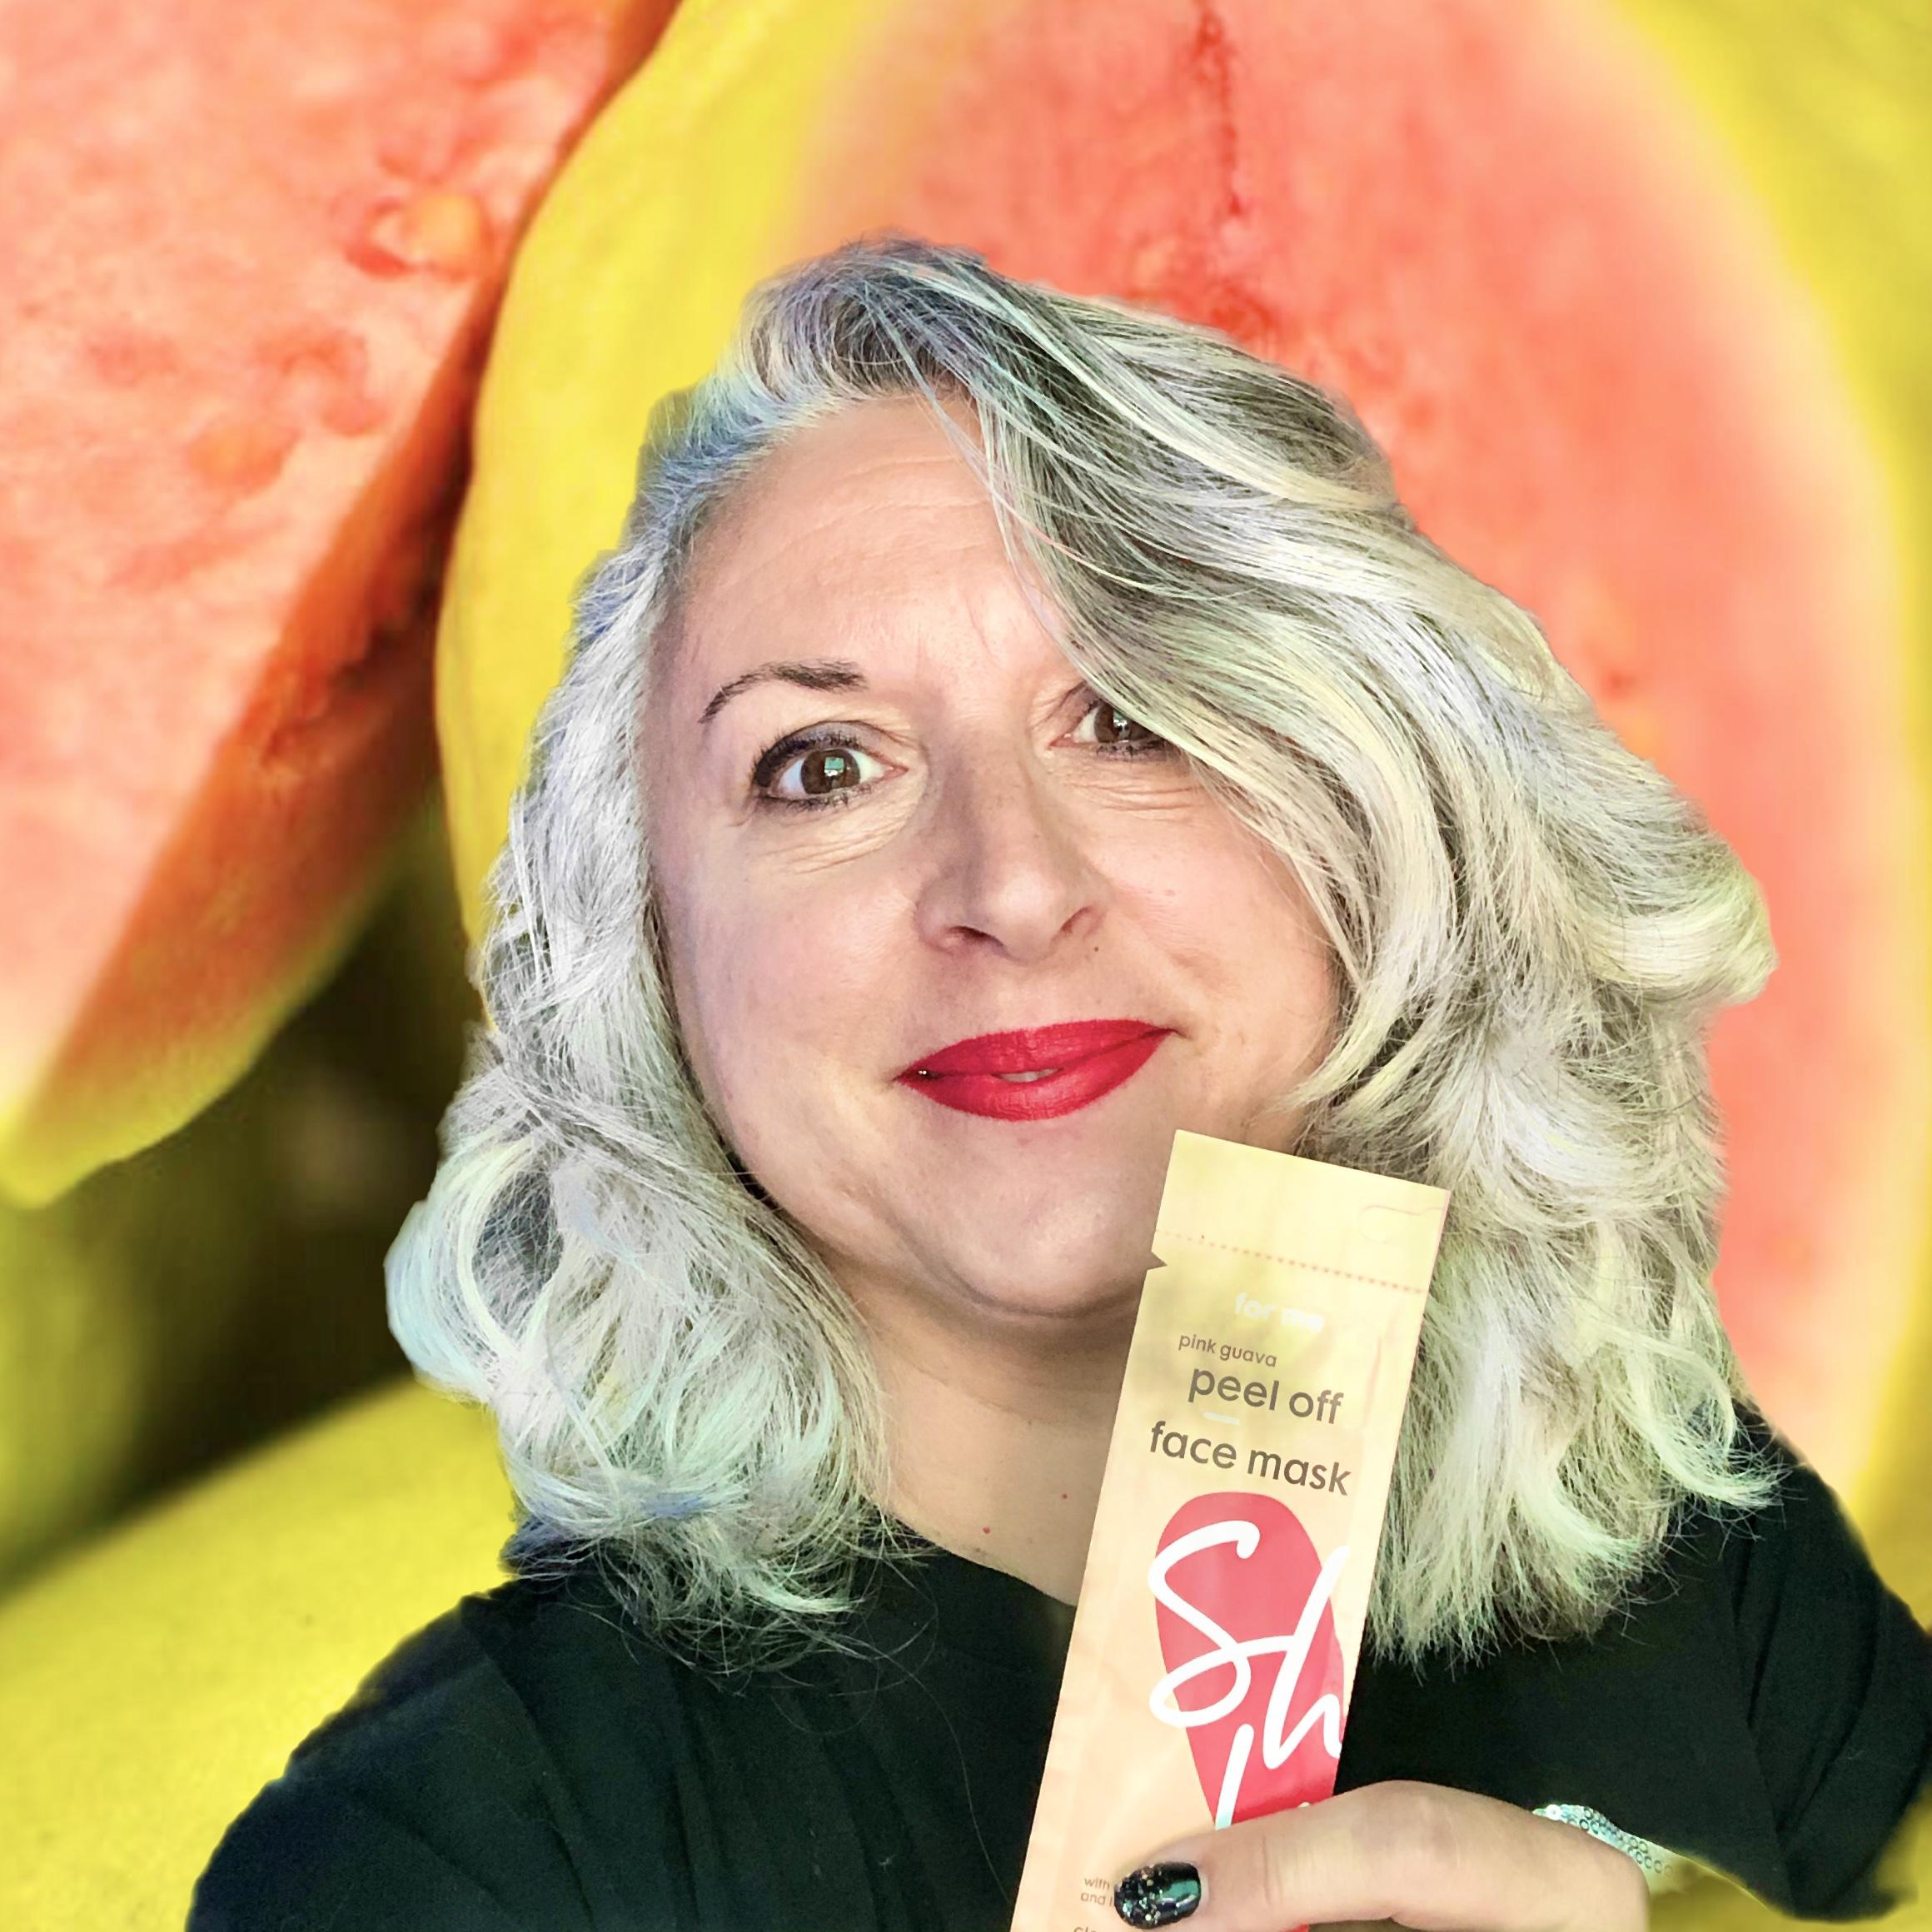 Masque HEMA share love peeloff guave, pomme et citron vert